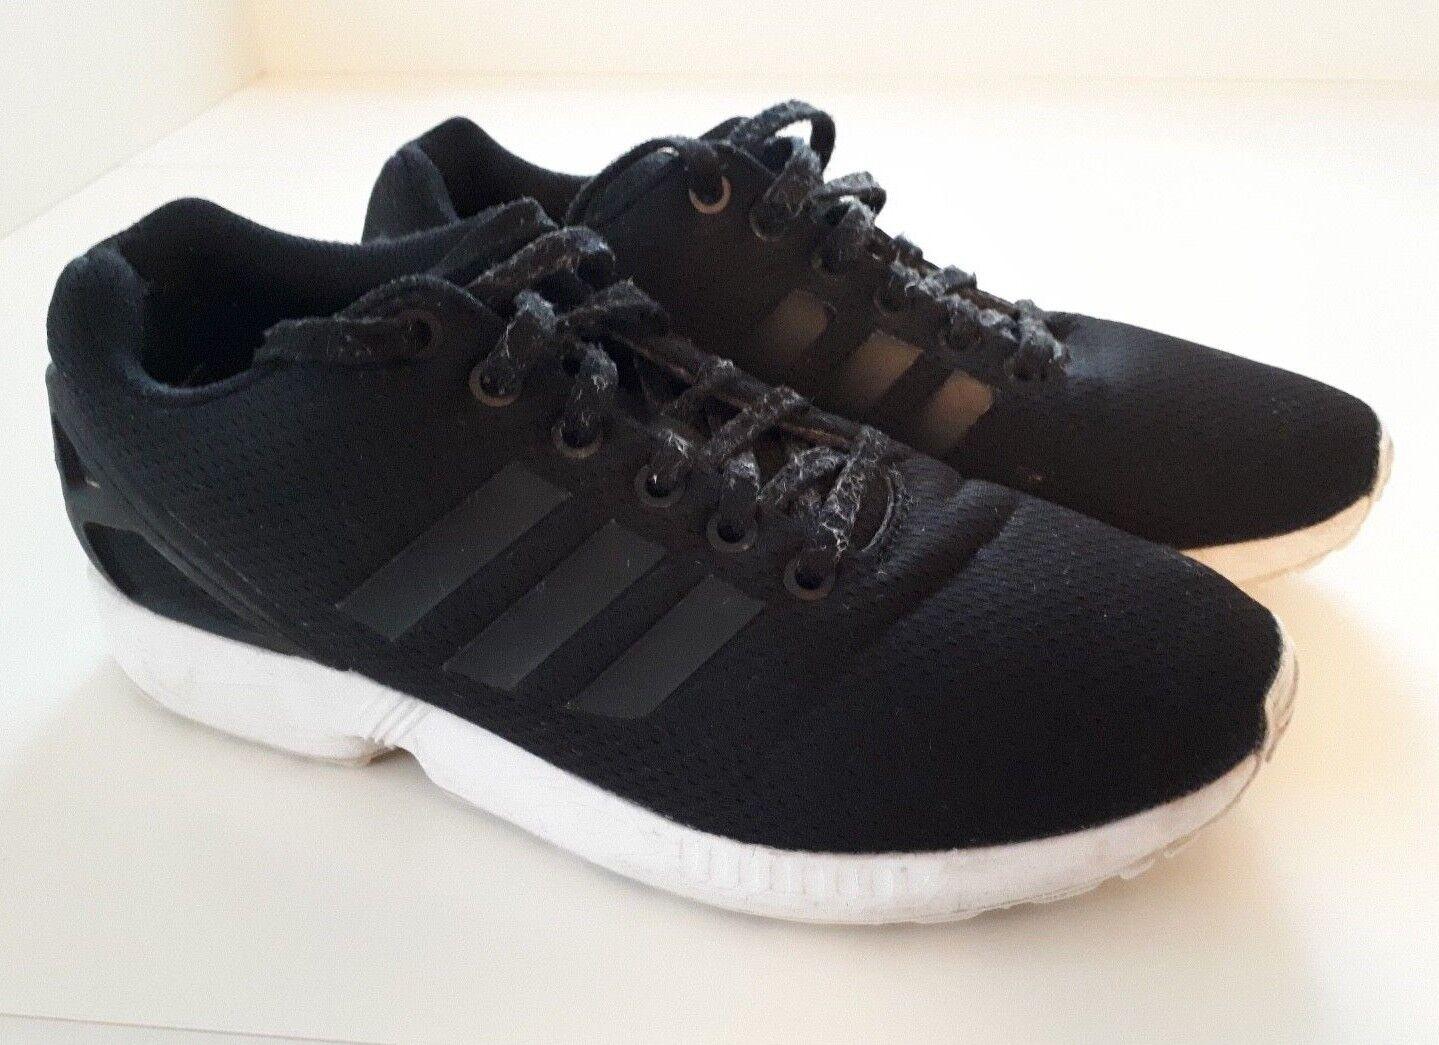 Adidas ZX FLUX Torsion Tubular Gr.40 core EQT NMD Tubular Torsion BLACK Sneaker TOP 89c689